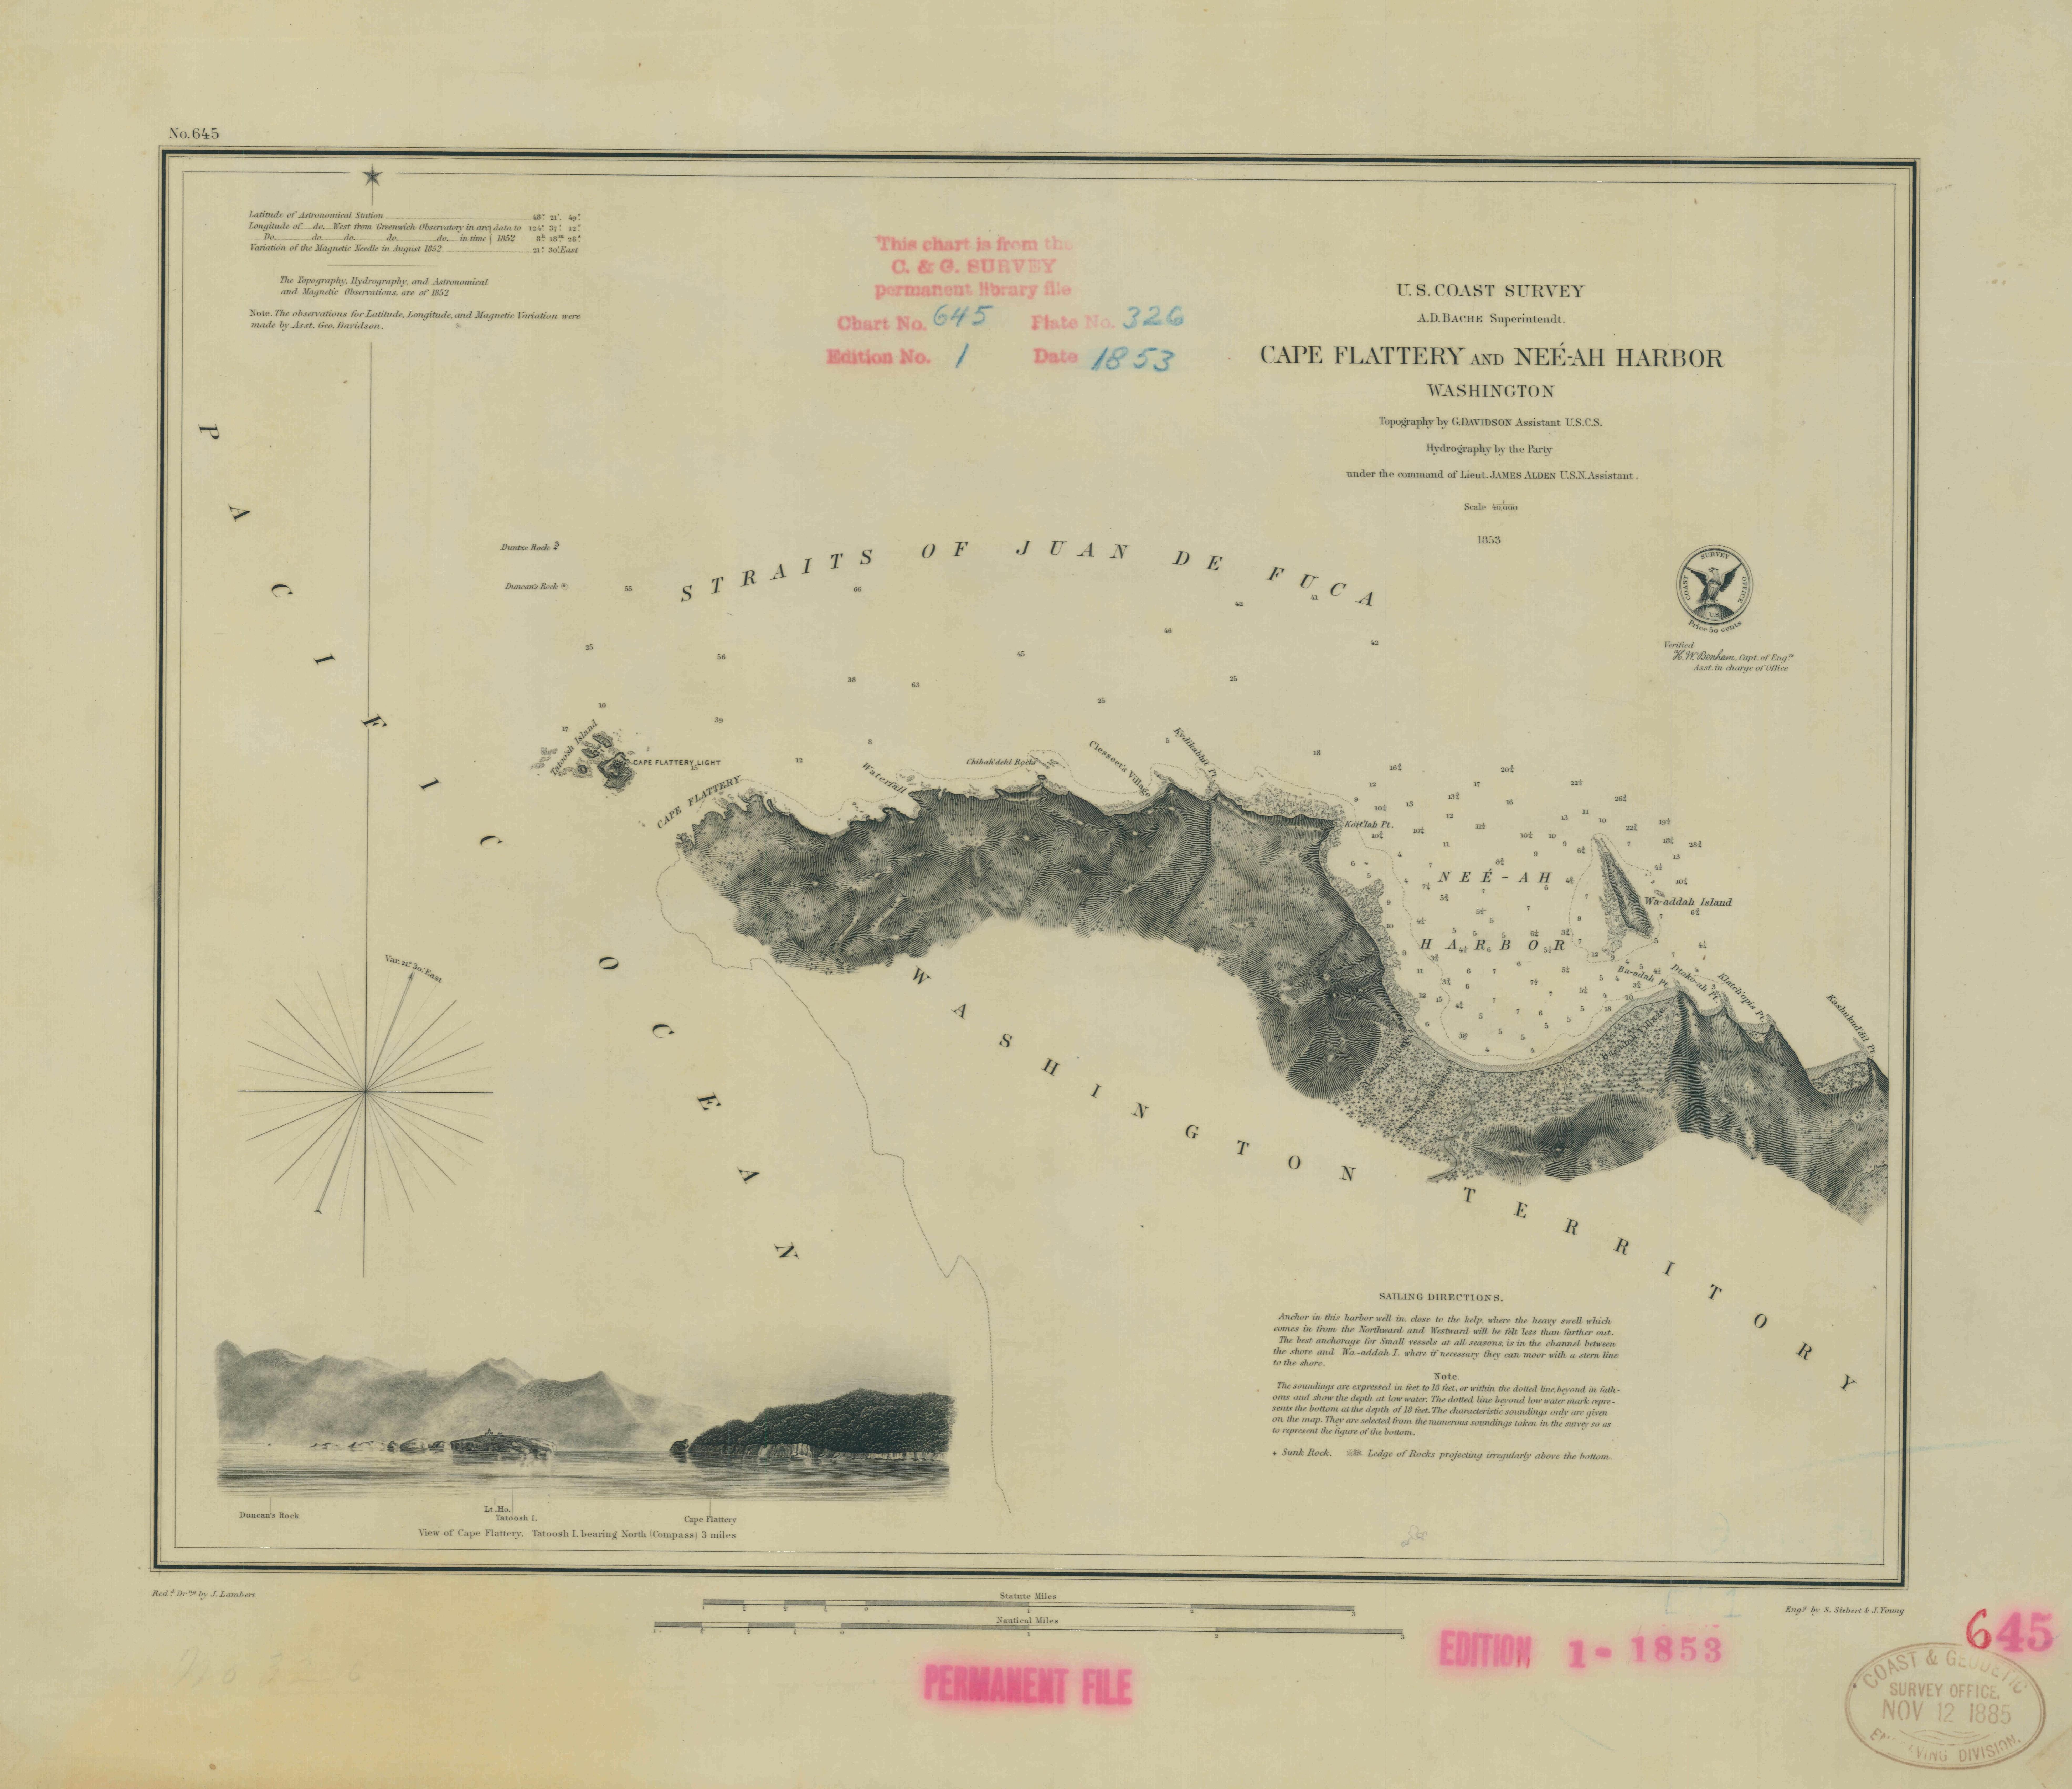 Map of Cape Flattery and Nee-Ah Harbor, Washington, 1853